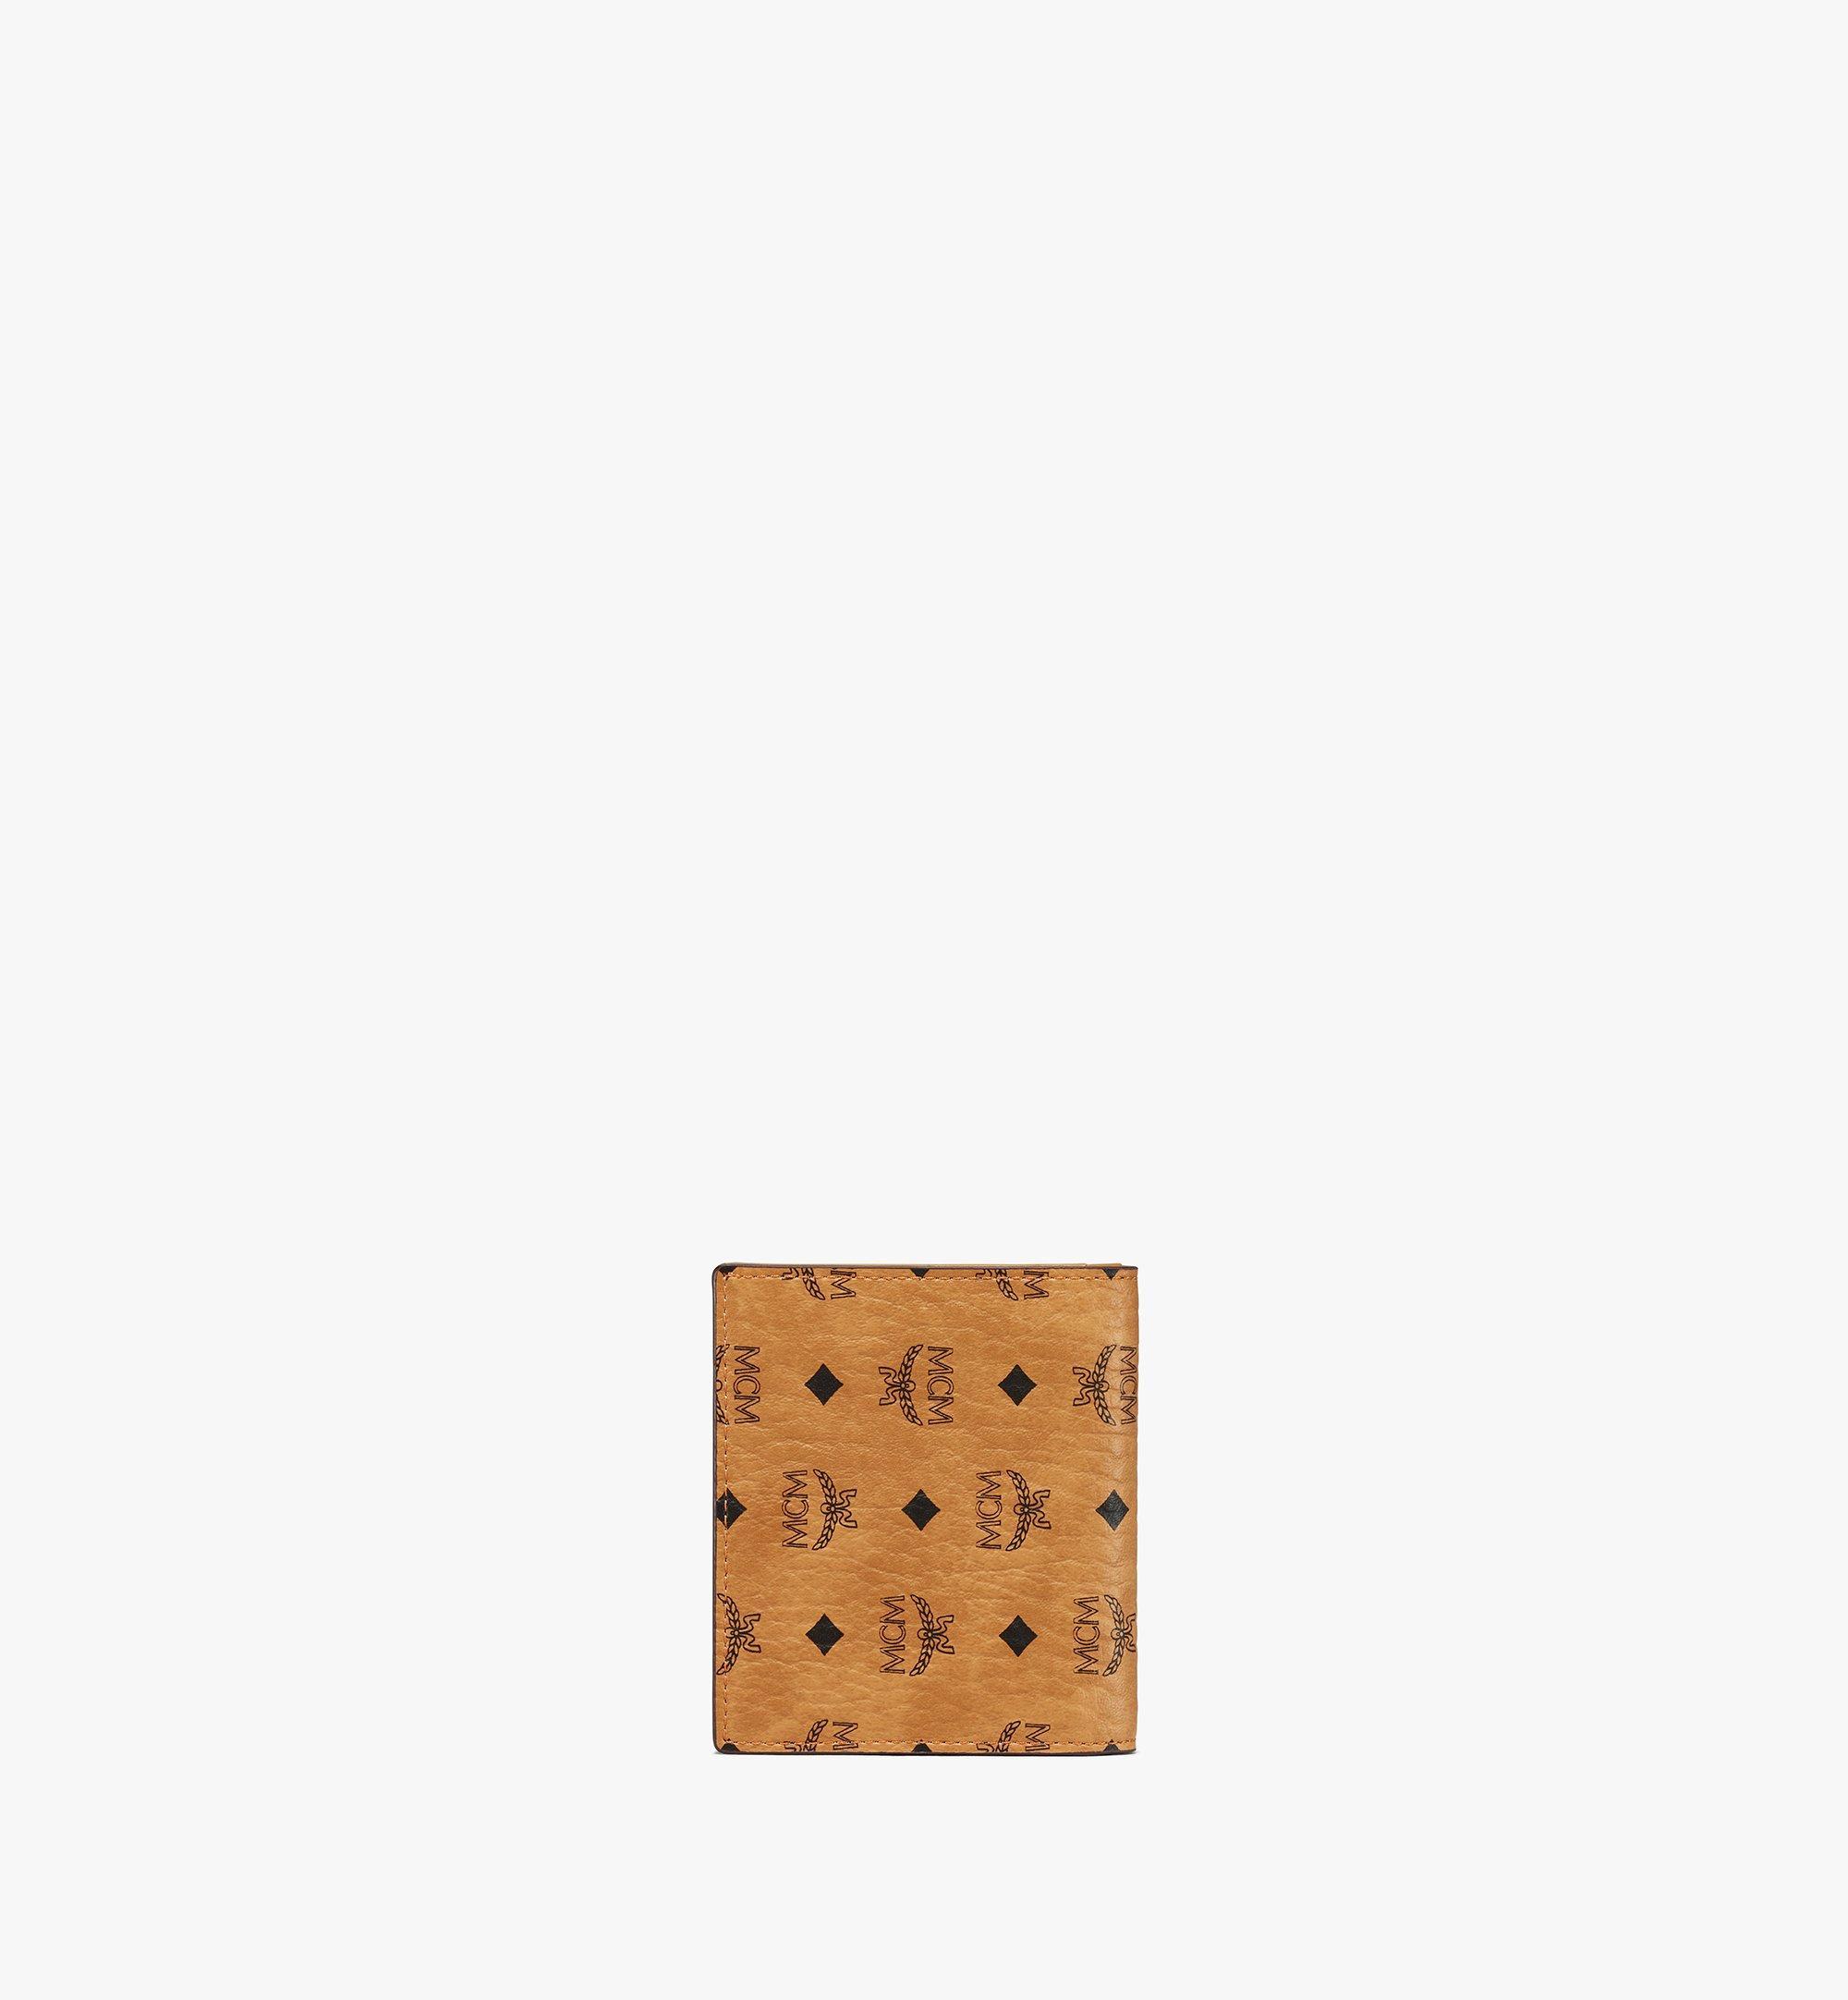 MCM Flat Wallet in Visetos Original Cognac MYSAAVI02CO001 Alternate View 2